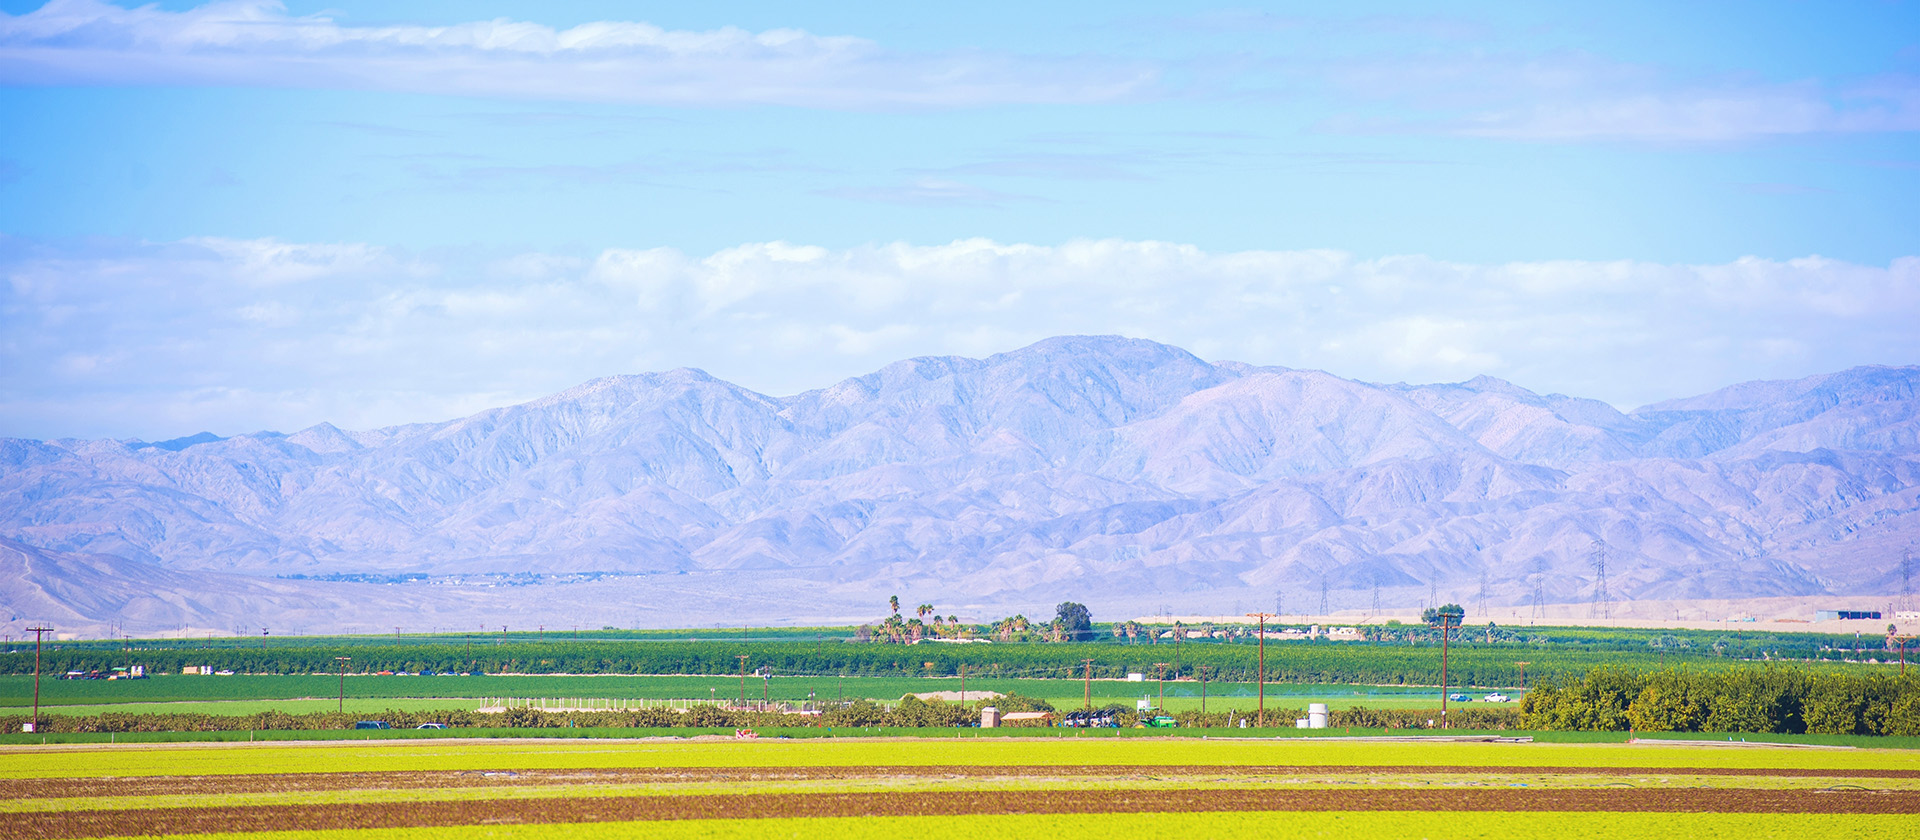 AgLand Renewables Receives California Competes Tax Credit